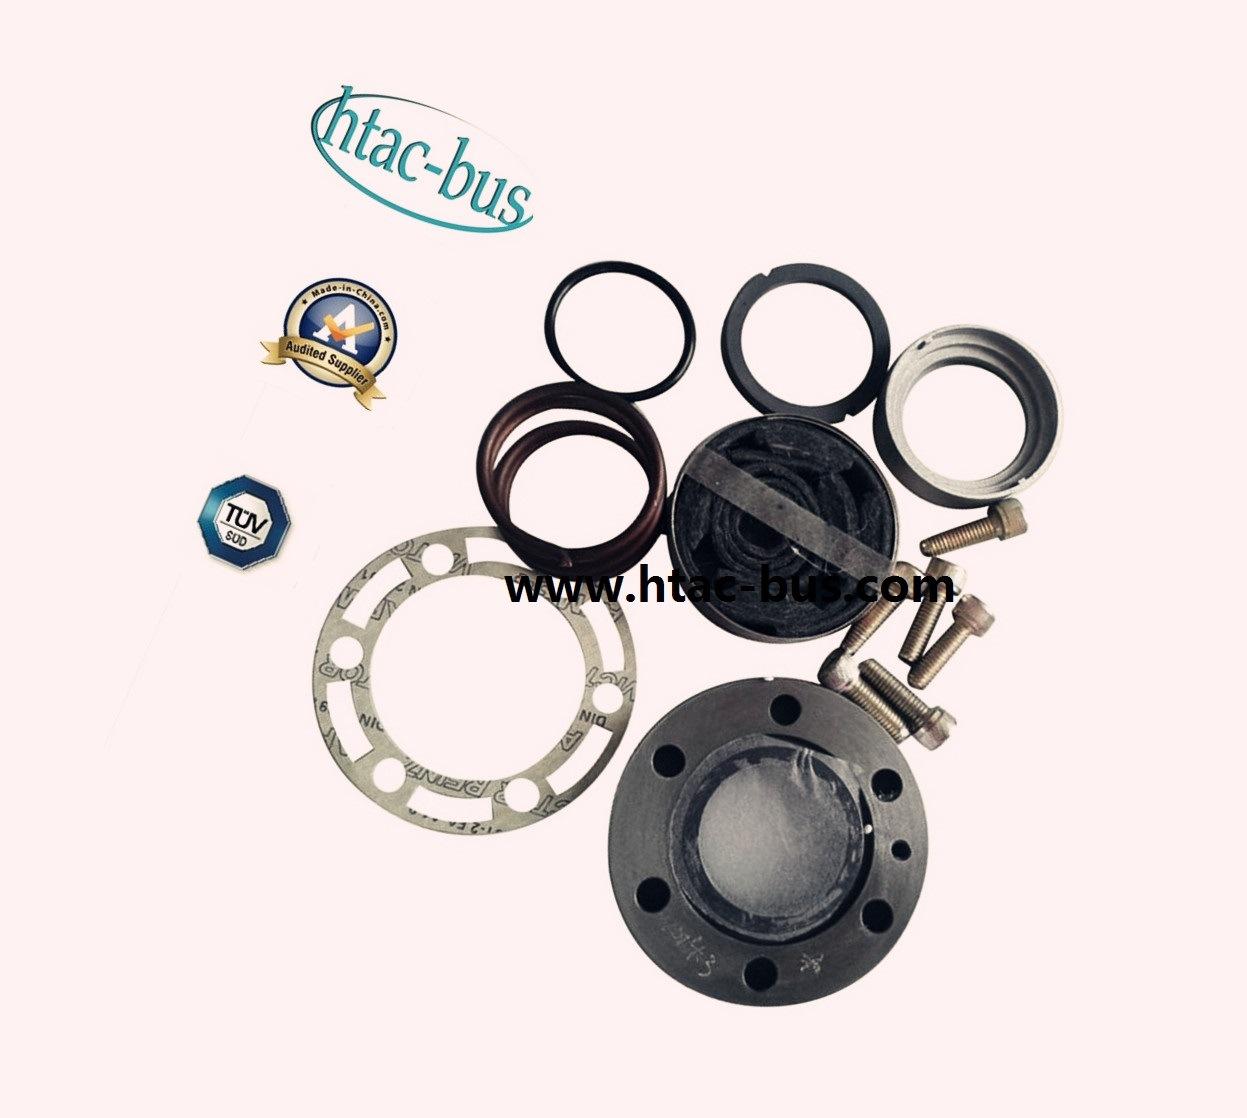 China Professional Supplier Bock Fkx40 Compressor Shaft Seal 80023